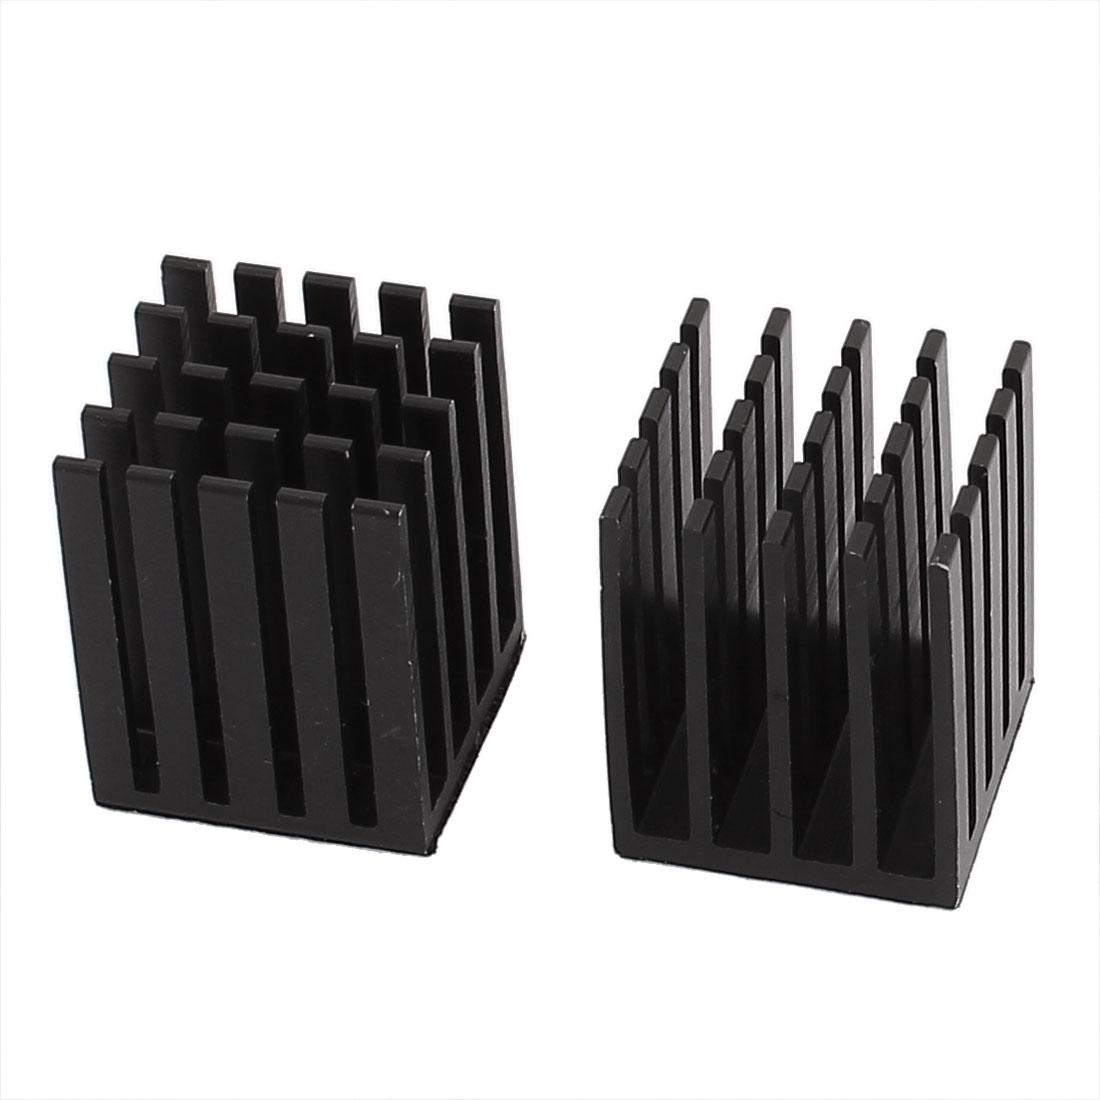 2 Pcs Silver Tone Aluminium Heatsink Cooling Fin 19 x 19 x 24mm for Chipset IC